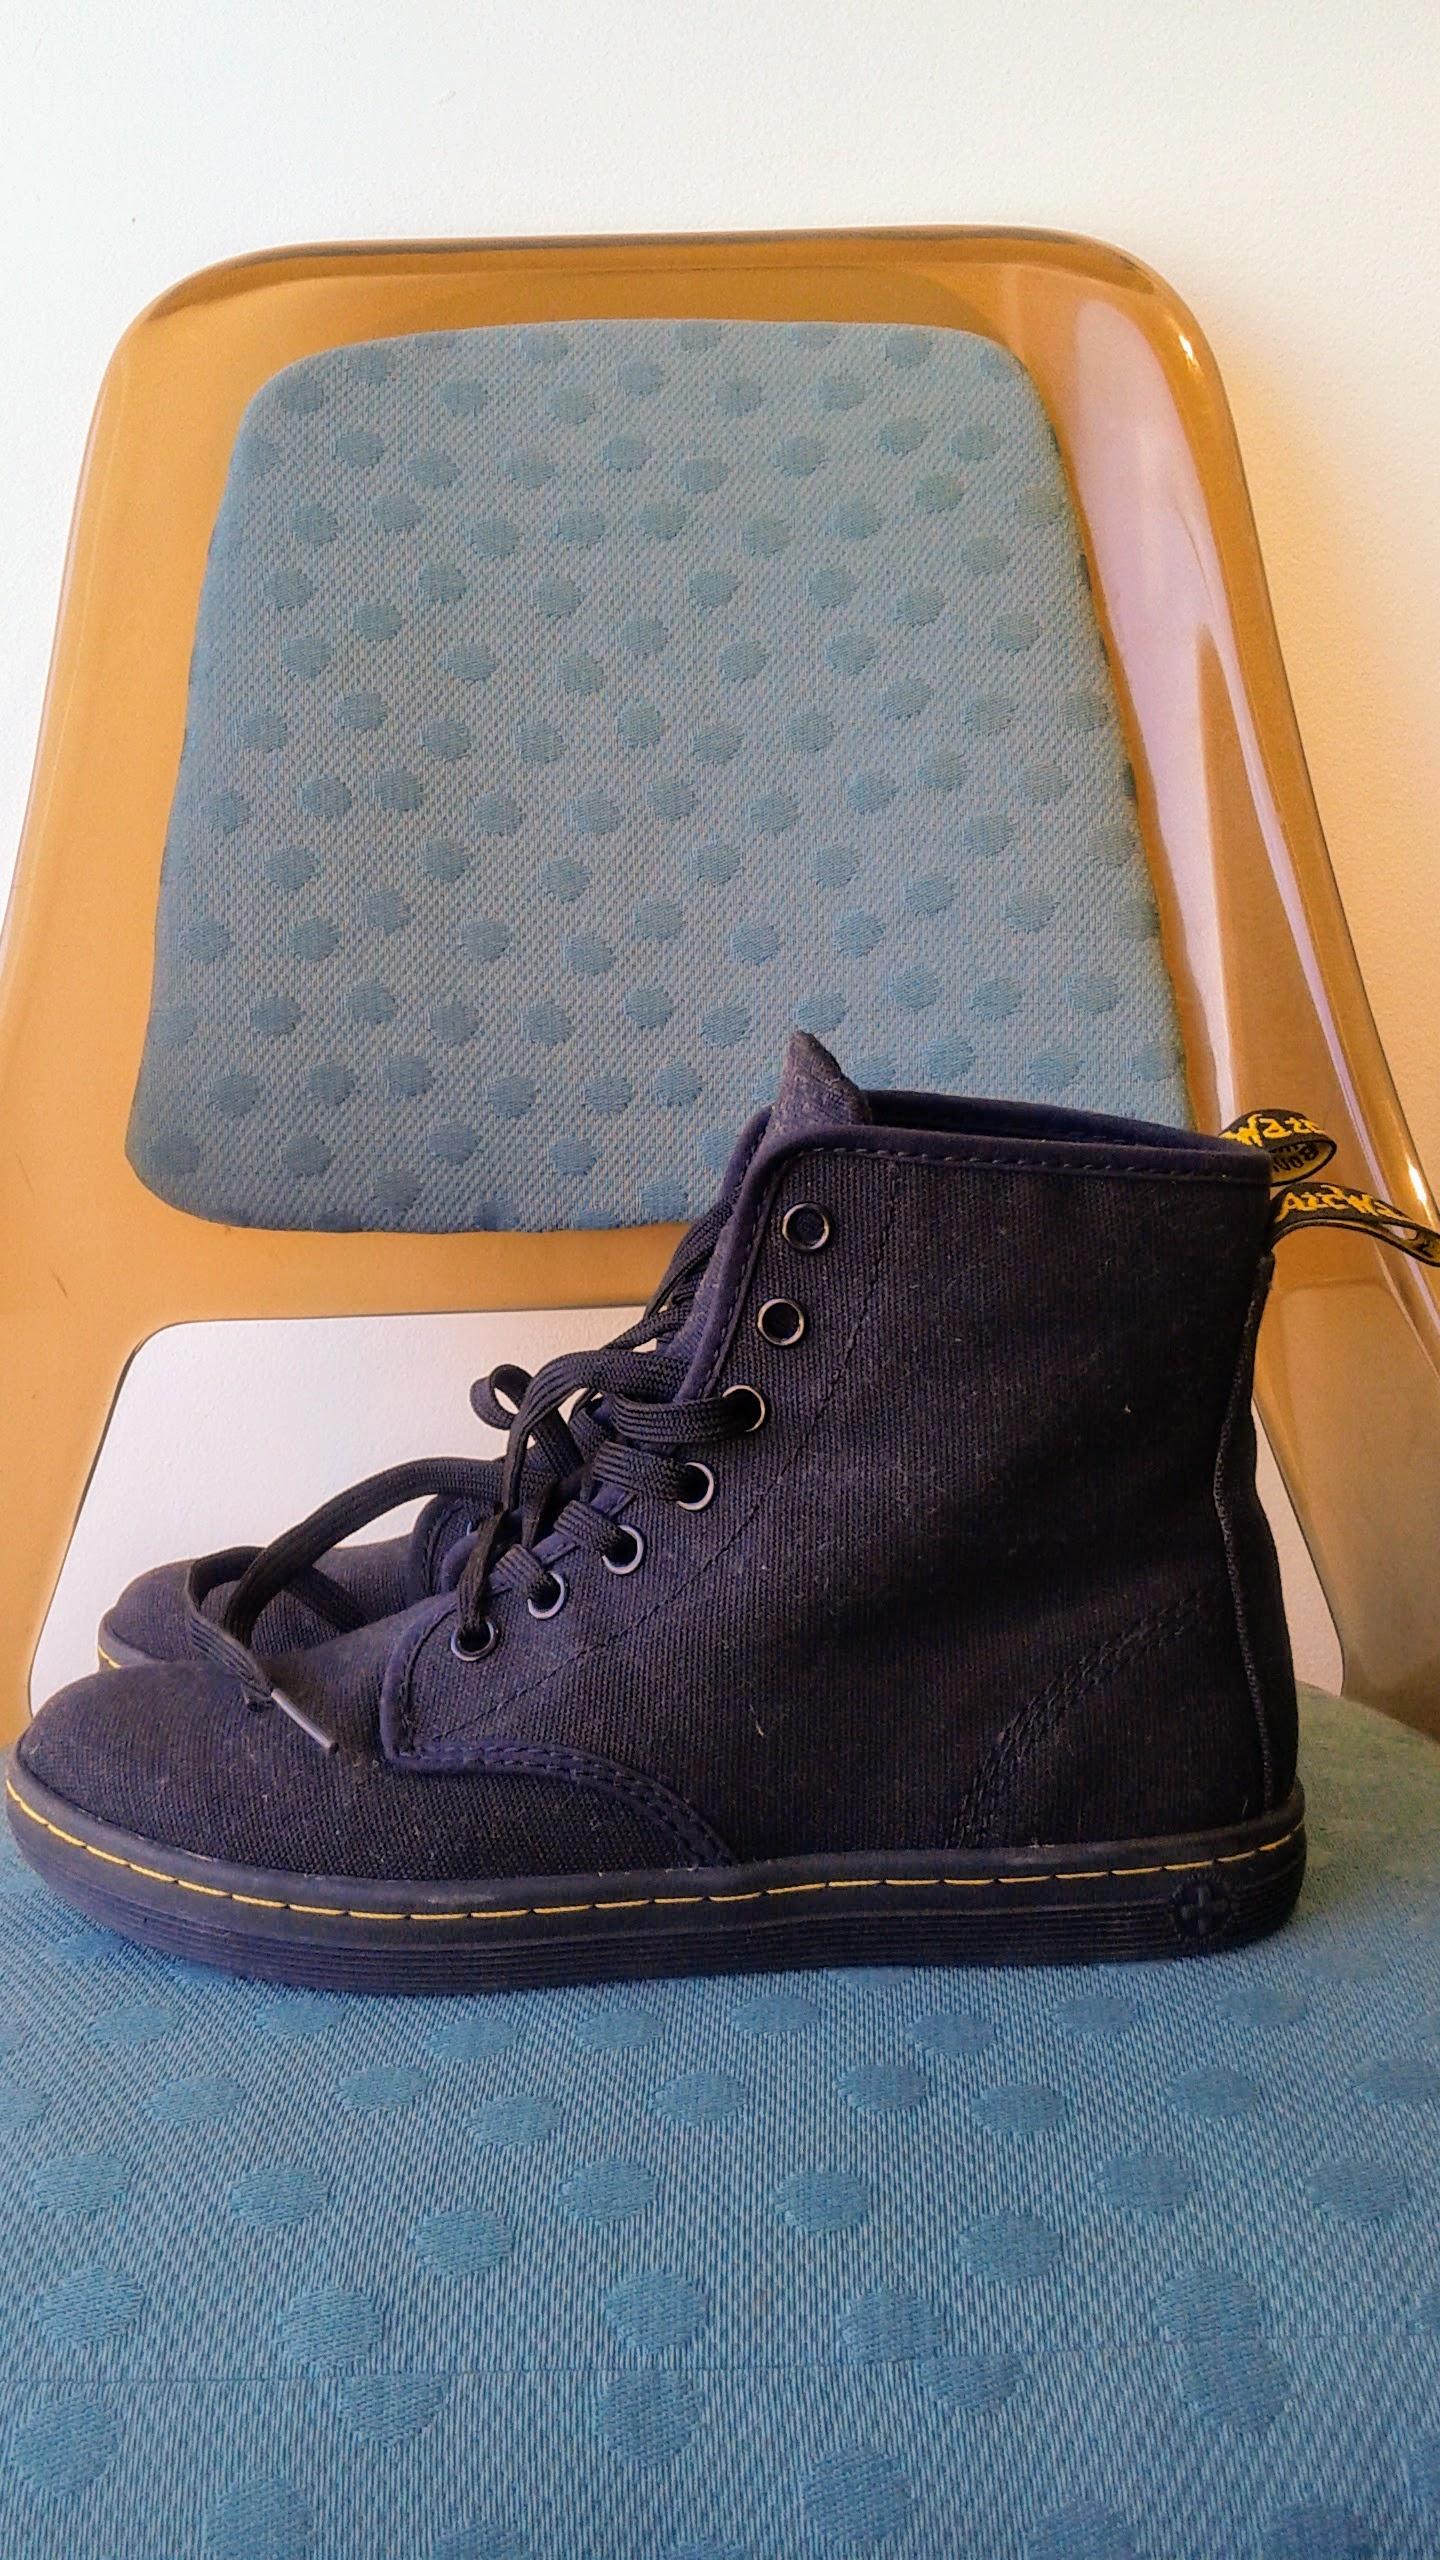 Dr Martin shoes; S7.5, $42